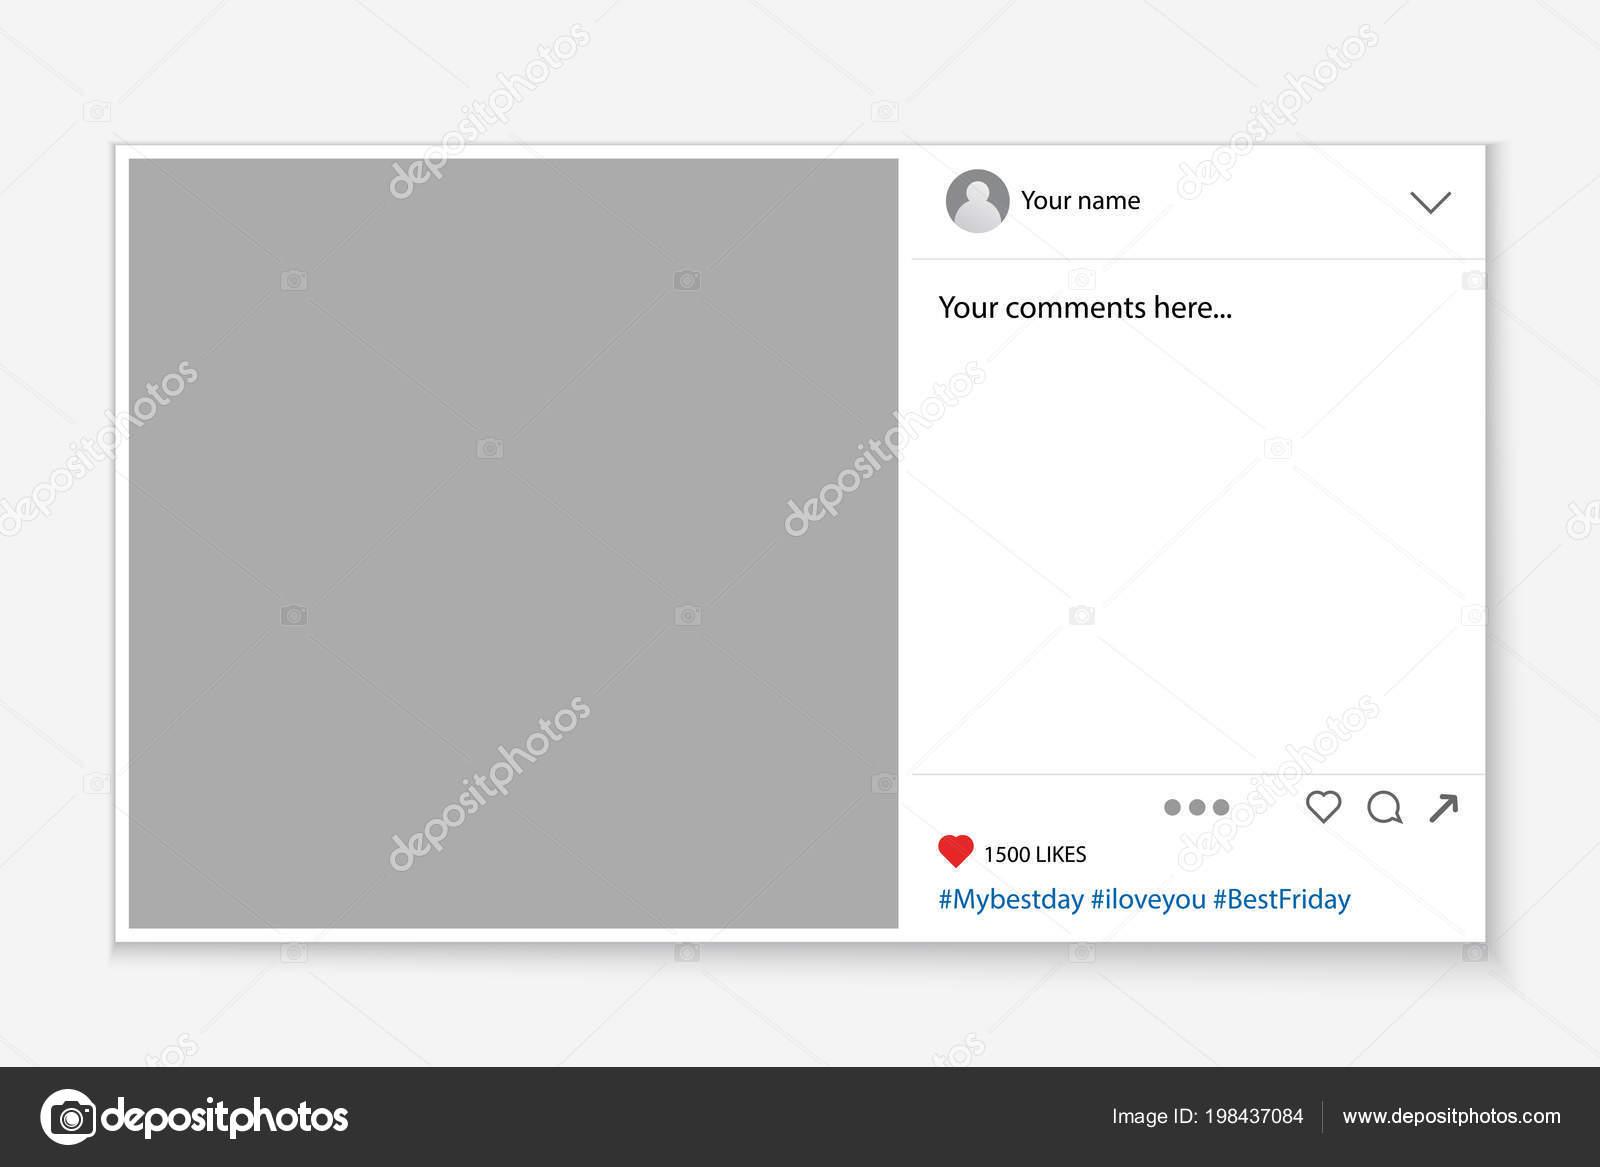 Atemberaubend Fotorahmen Prop Ideen - Benutzerdefinierte ...